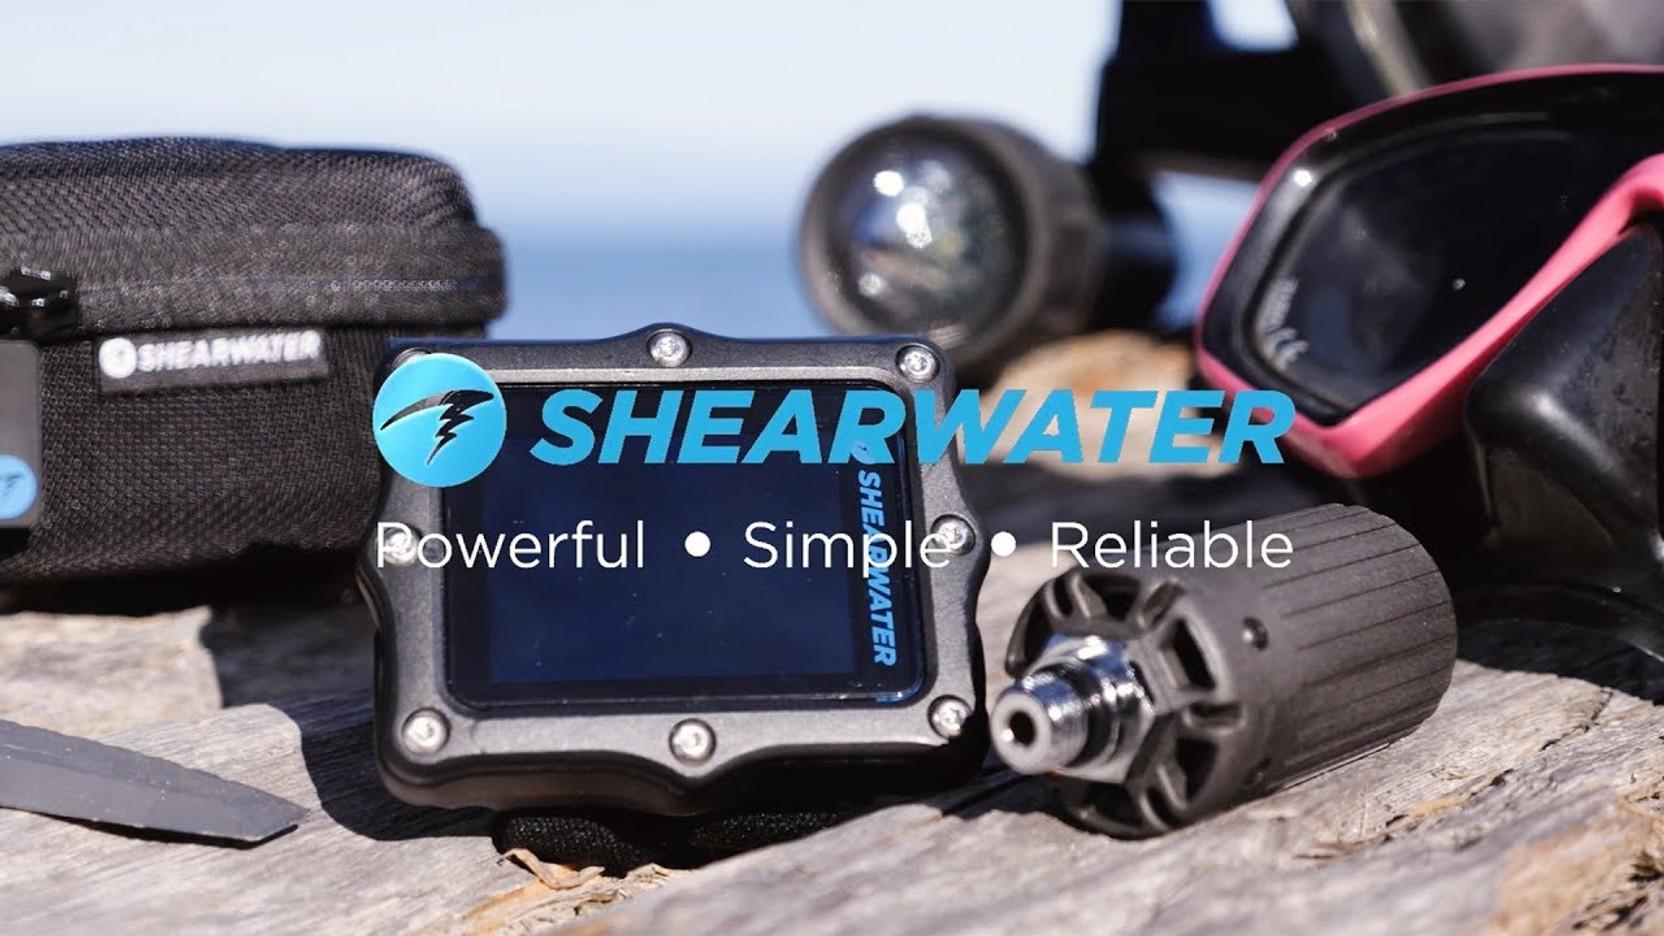 Shearwater Perdix AI - Recreational and Technical Scuba Diving Computer Video